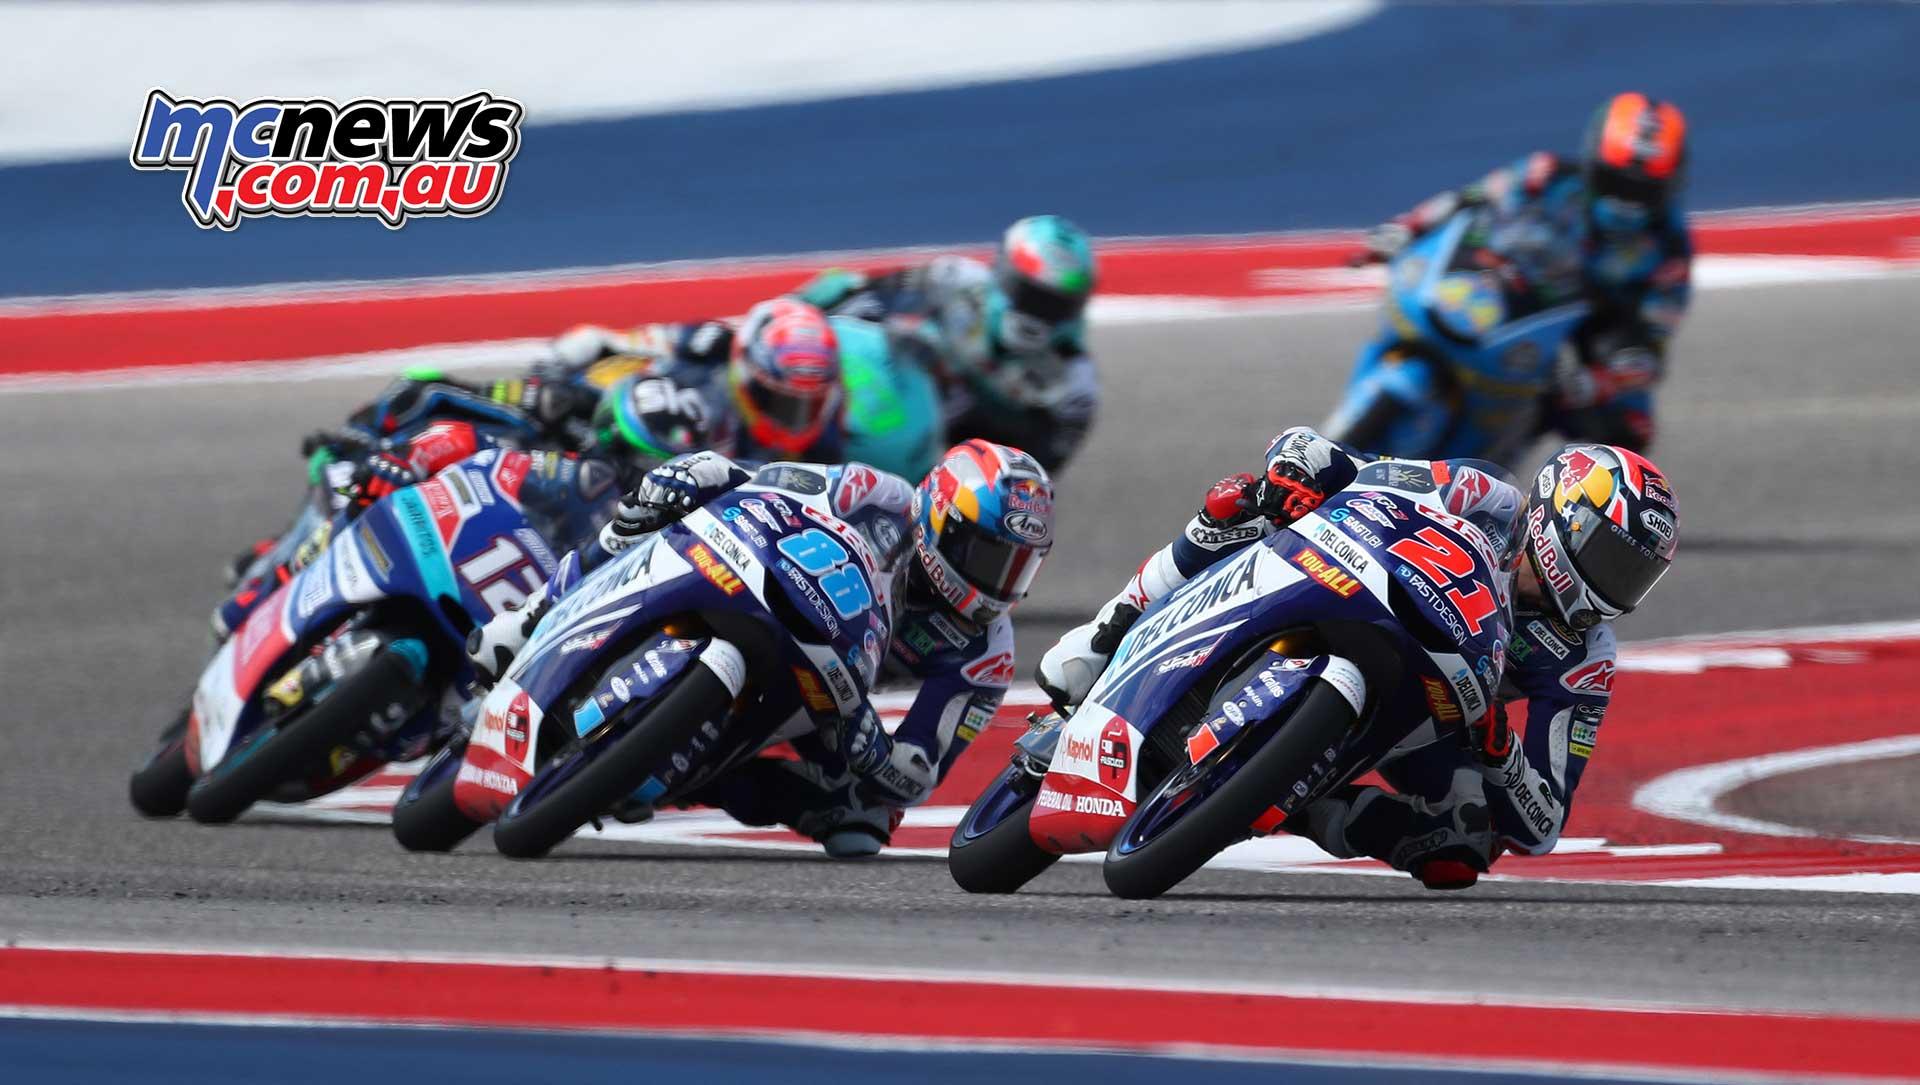 Moto2 and Moto3 Image Gallery from COTA MotoGP | MCNews.com.au